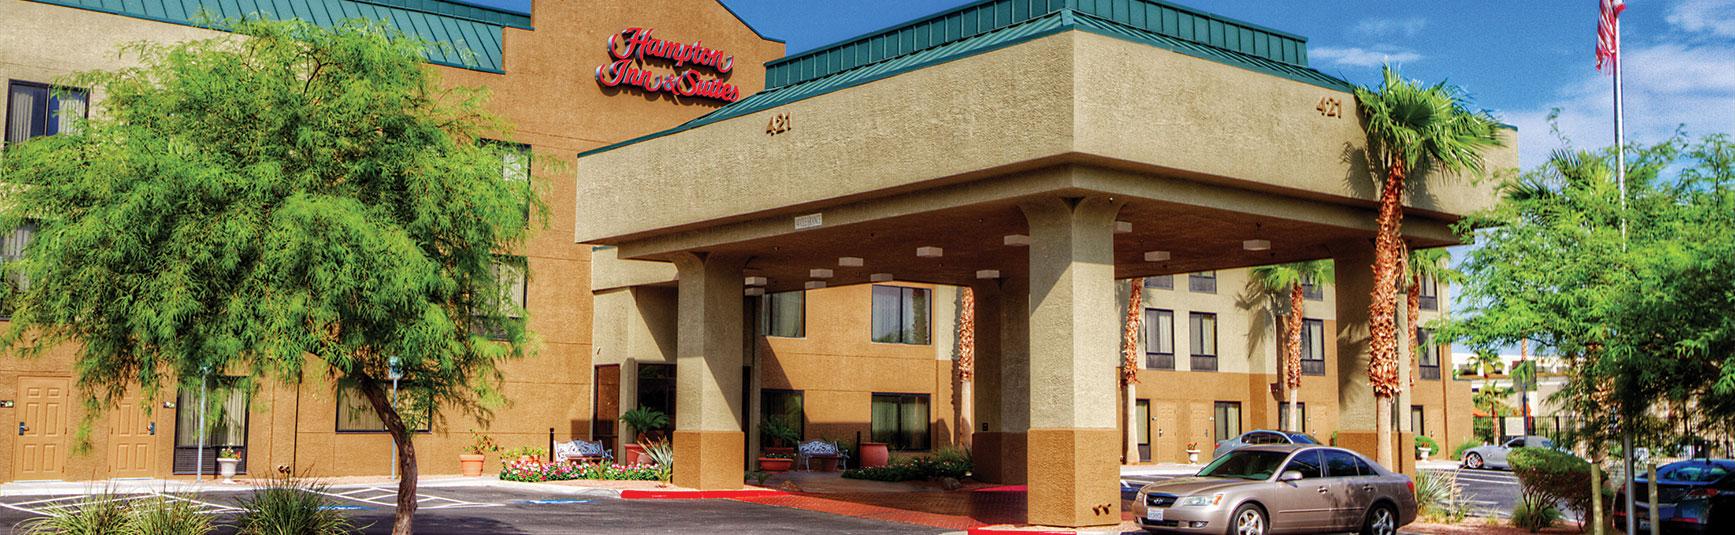 Hampton Inn & Suites – Henderson